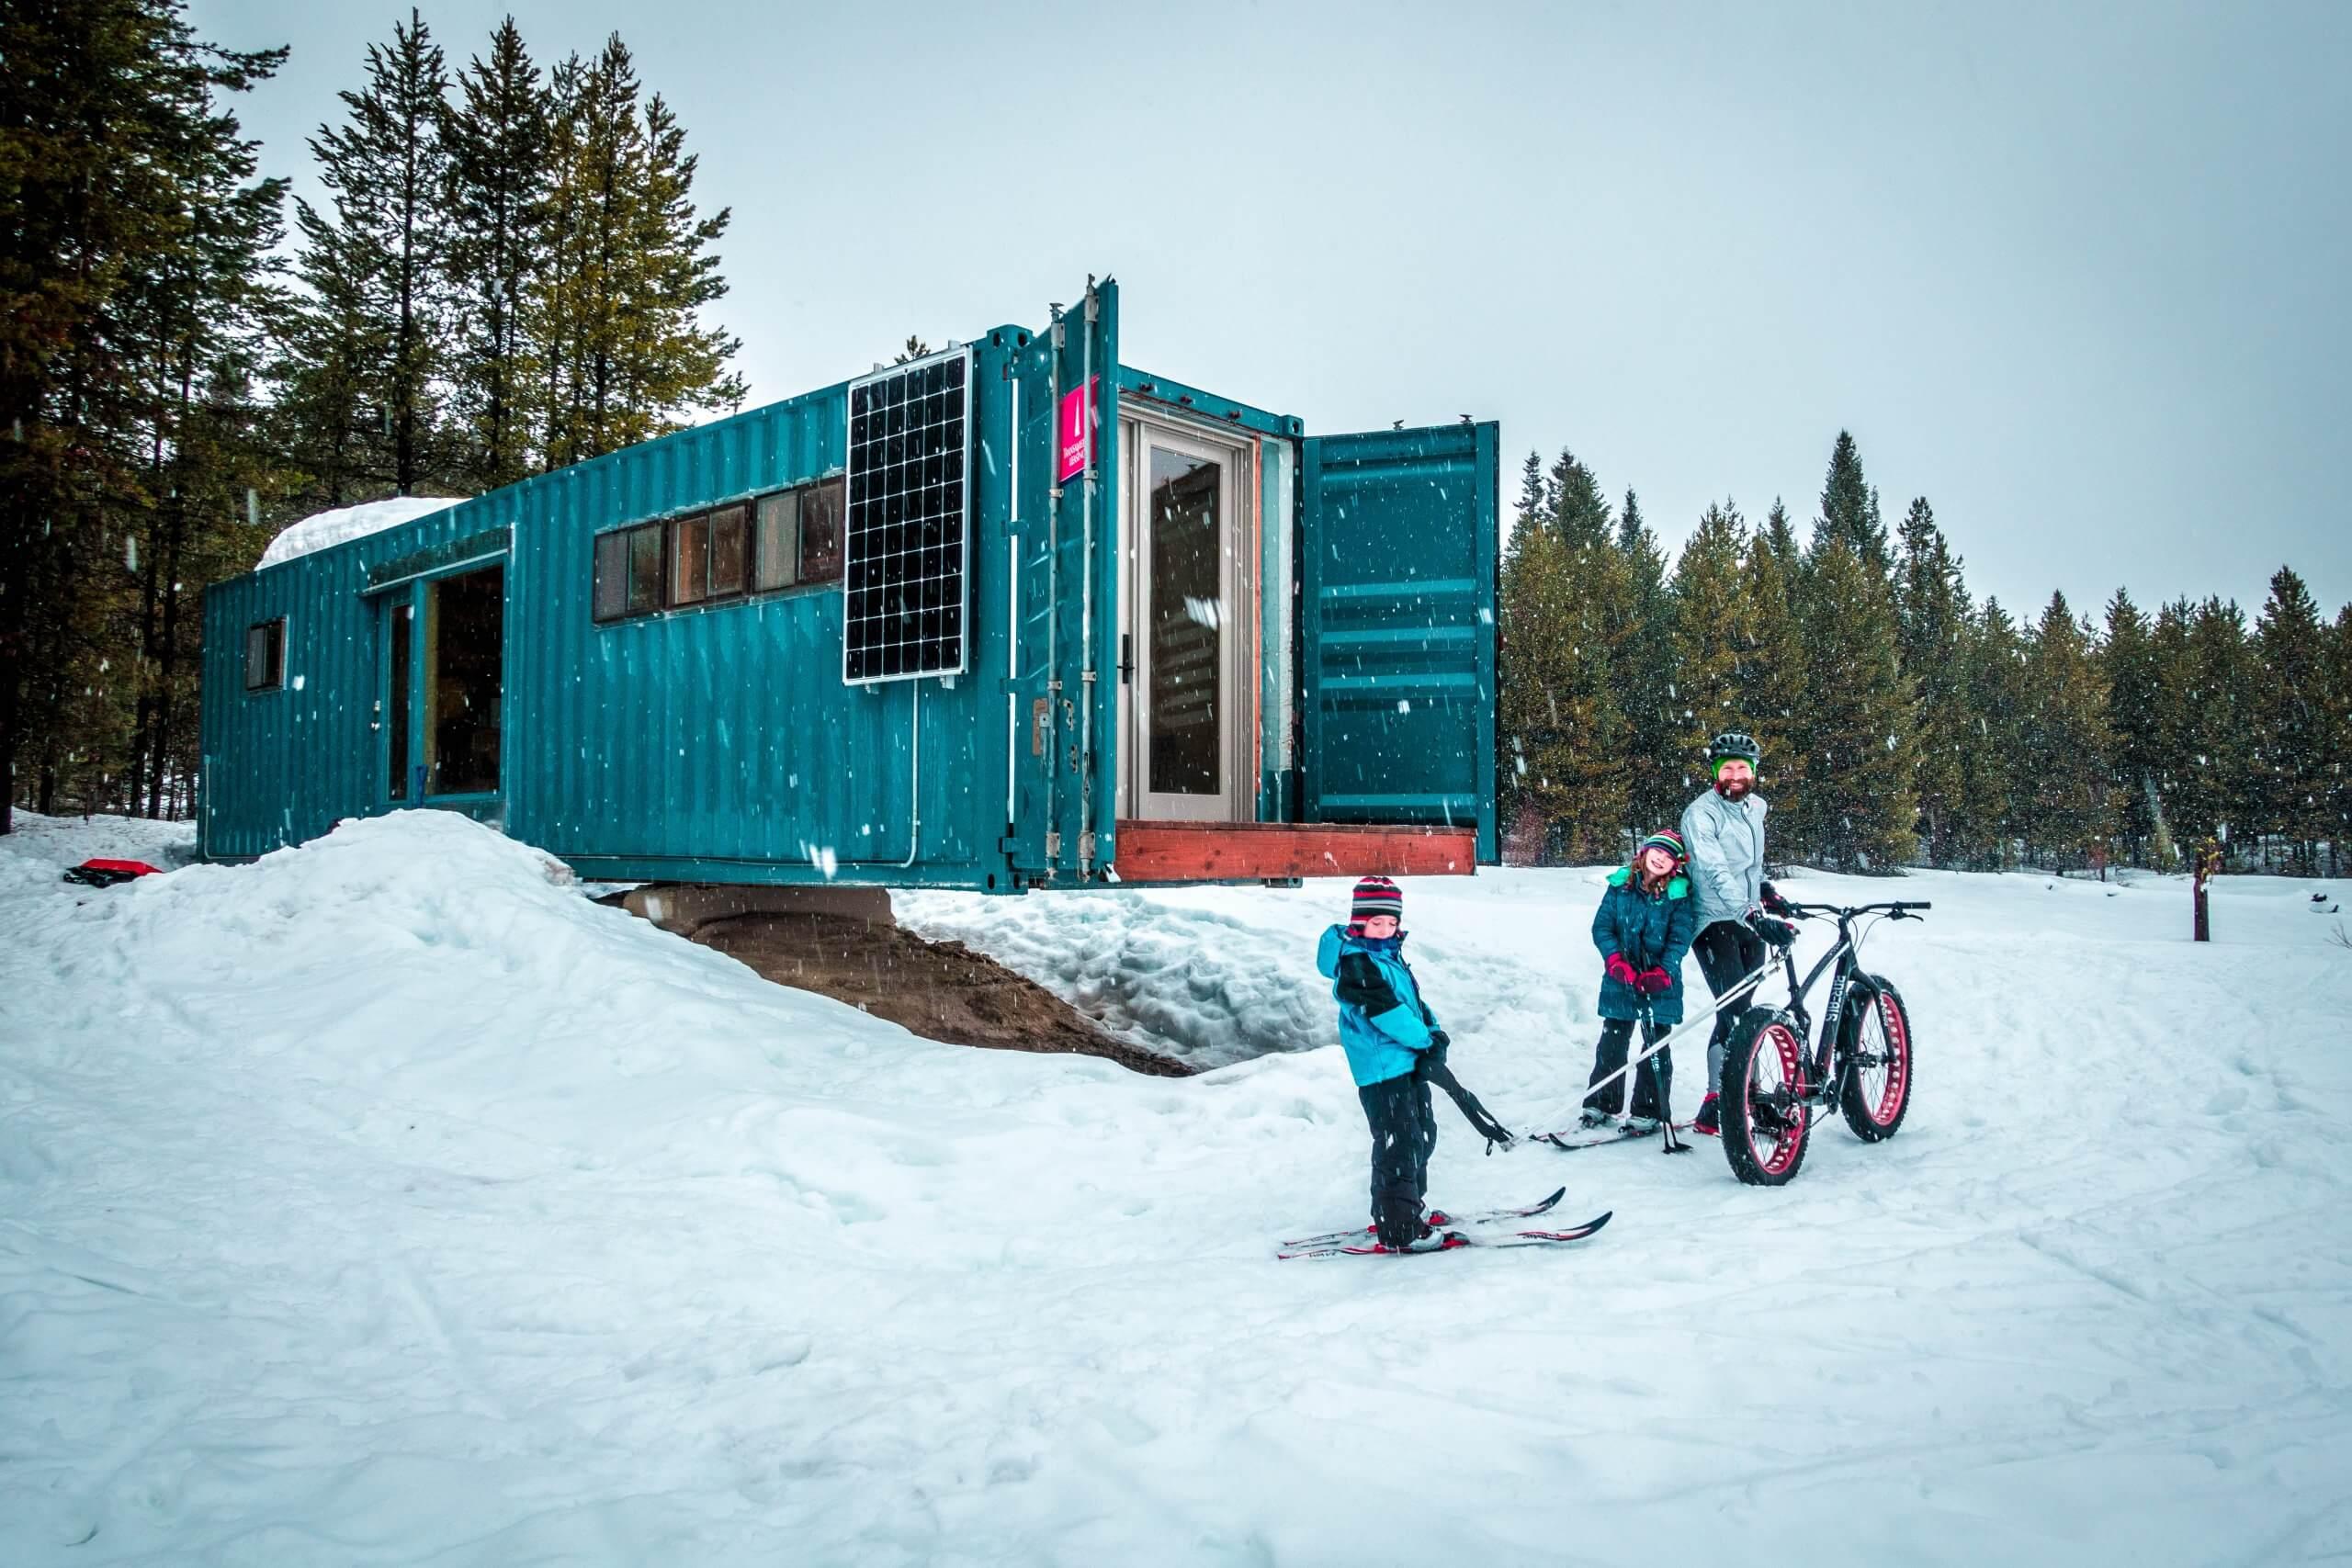 Cargo container cabin at Jug Mountain Ranch.